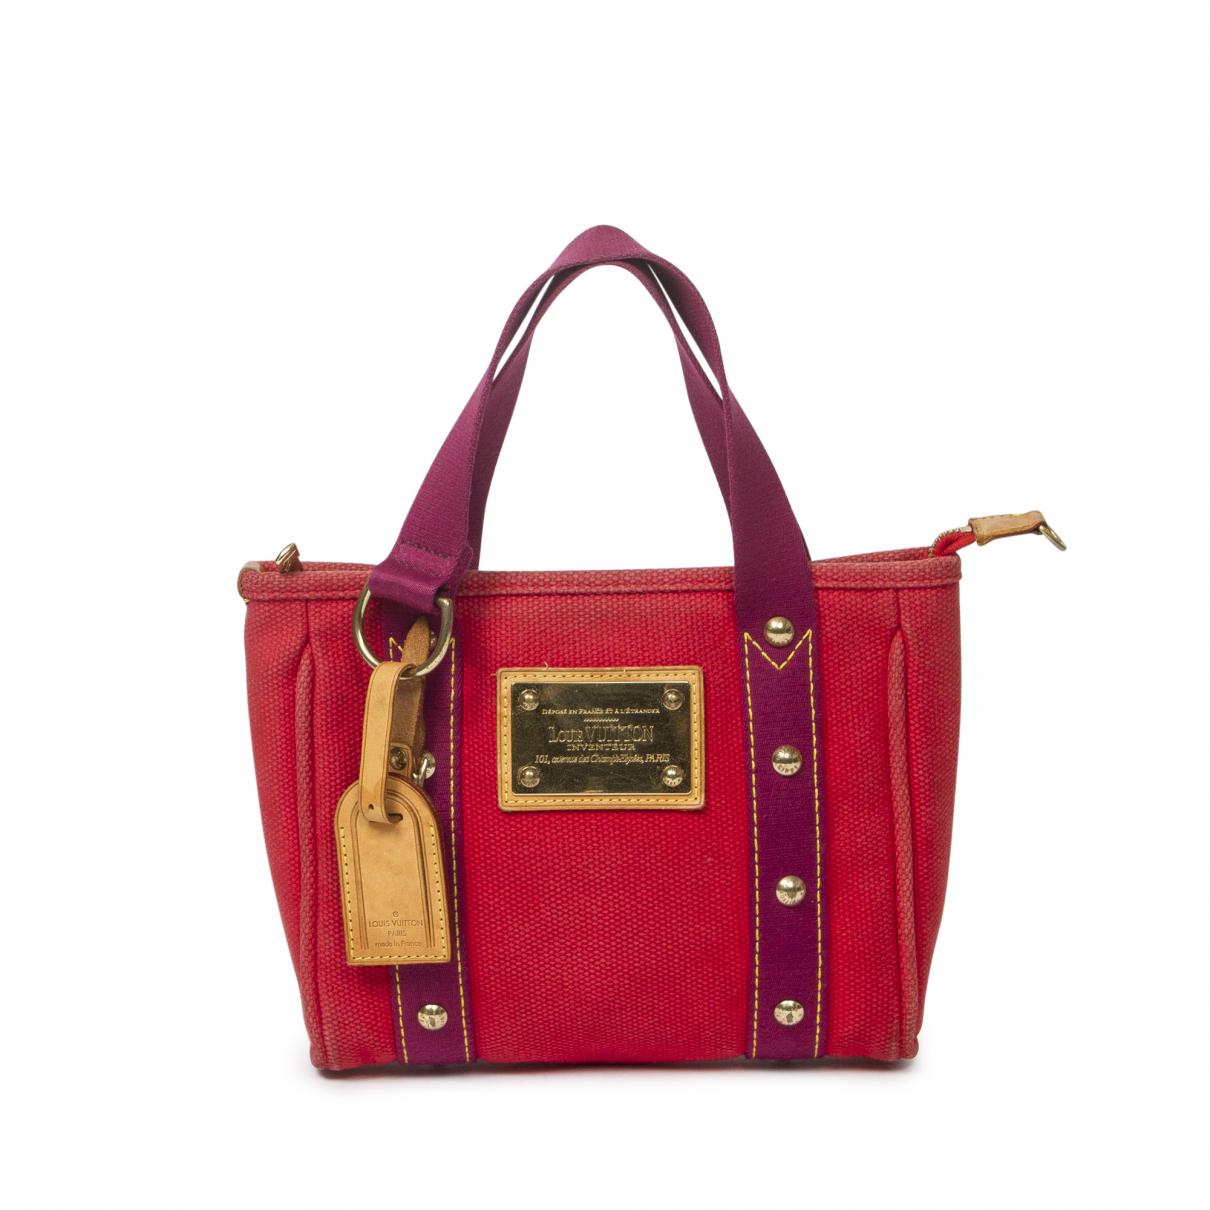 Louis Vuitton Antigua Handtasche in Leder